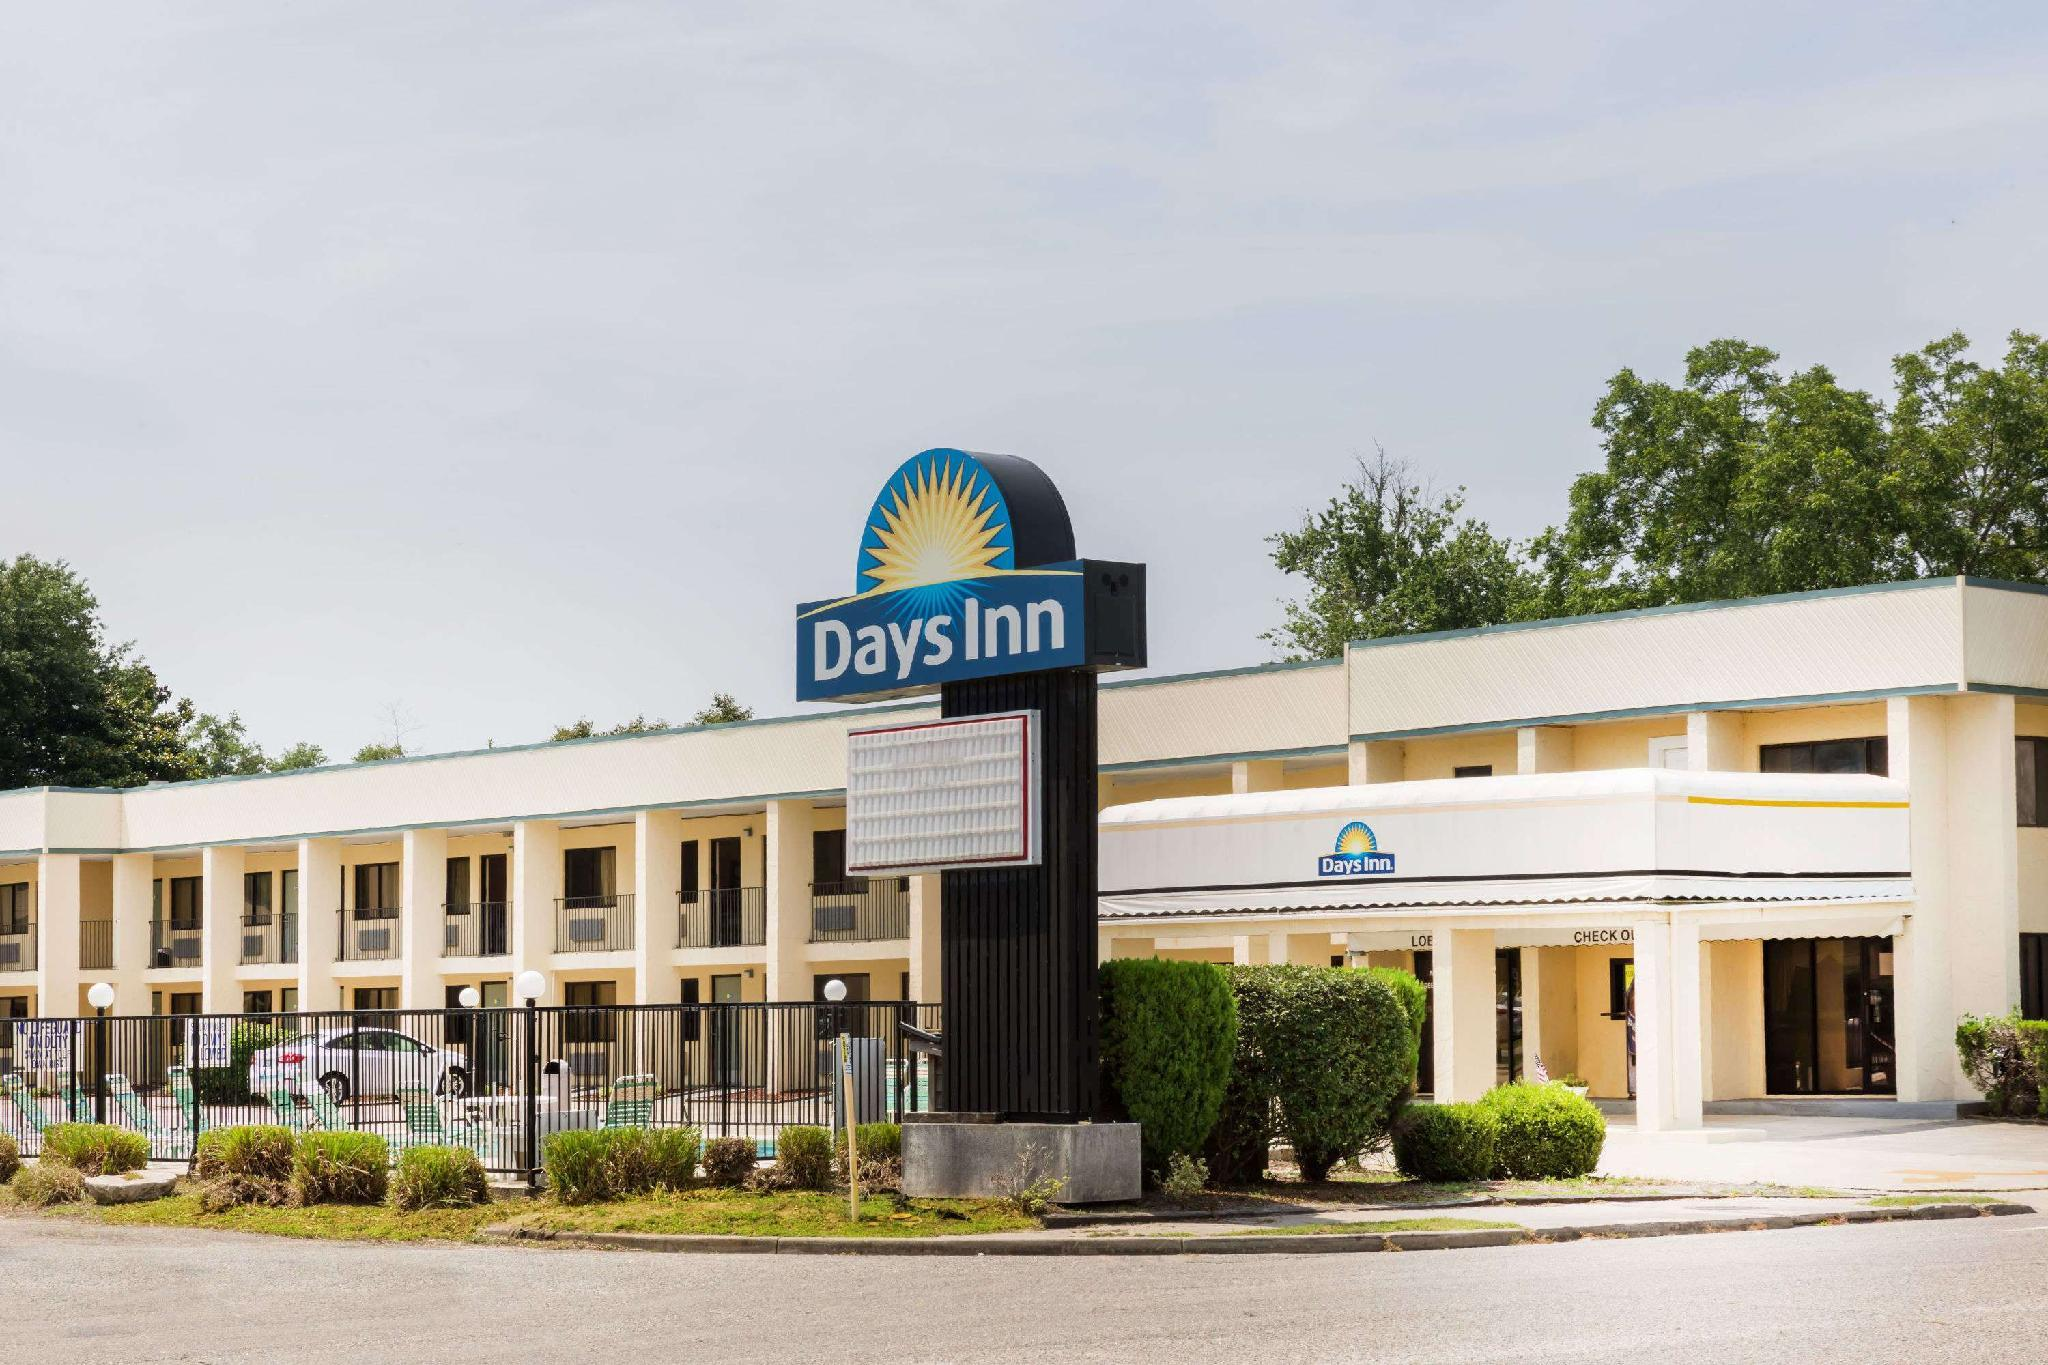 Days Inn By Wyndham Little River